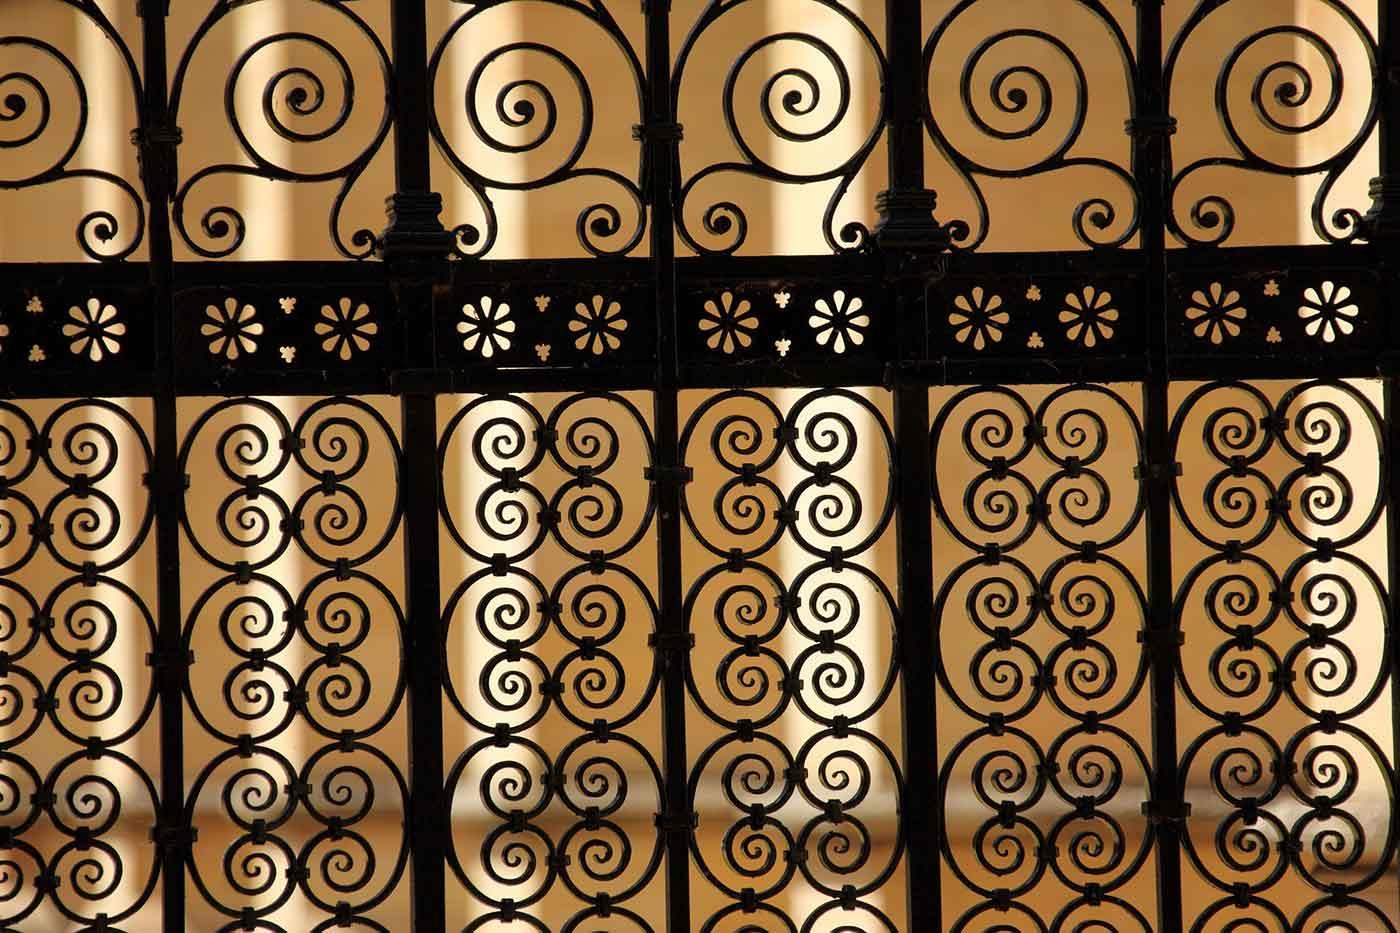 Ornamental bars